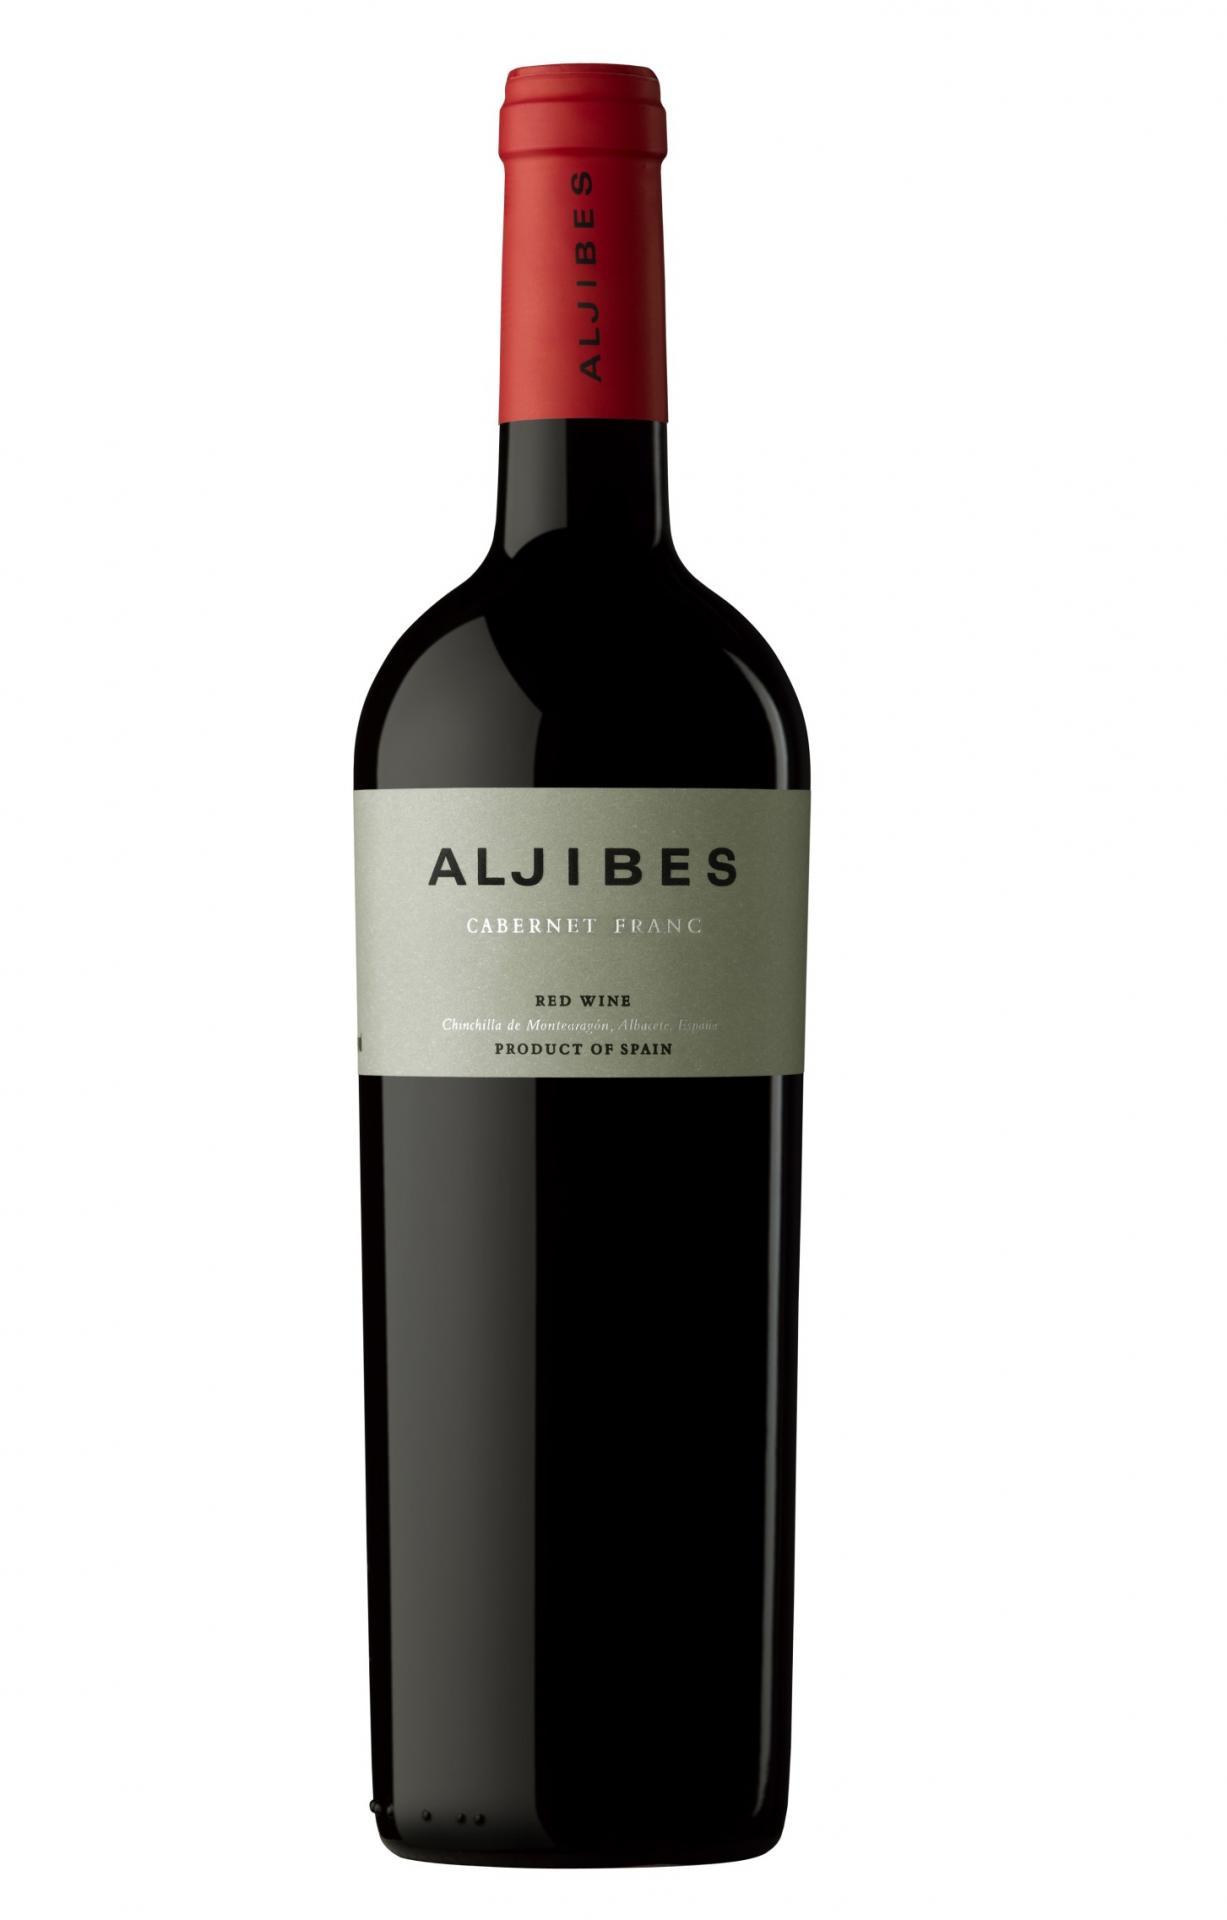 Aljibes Cabernet Franc 2014